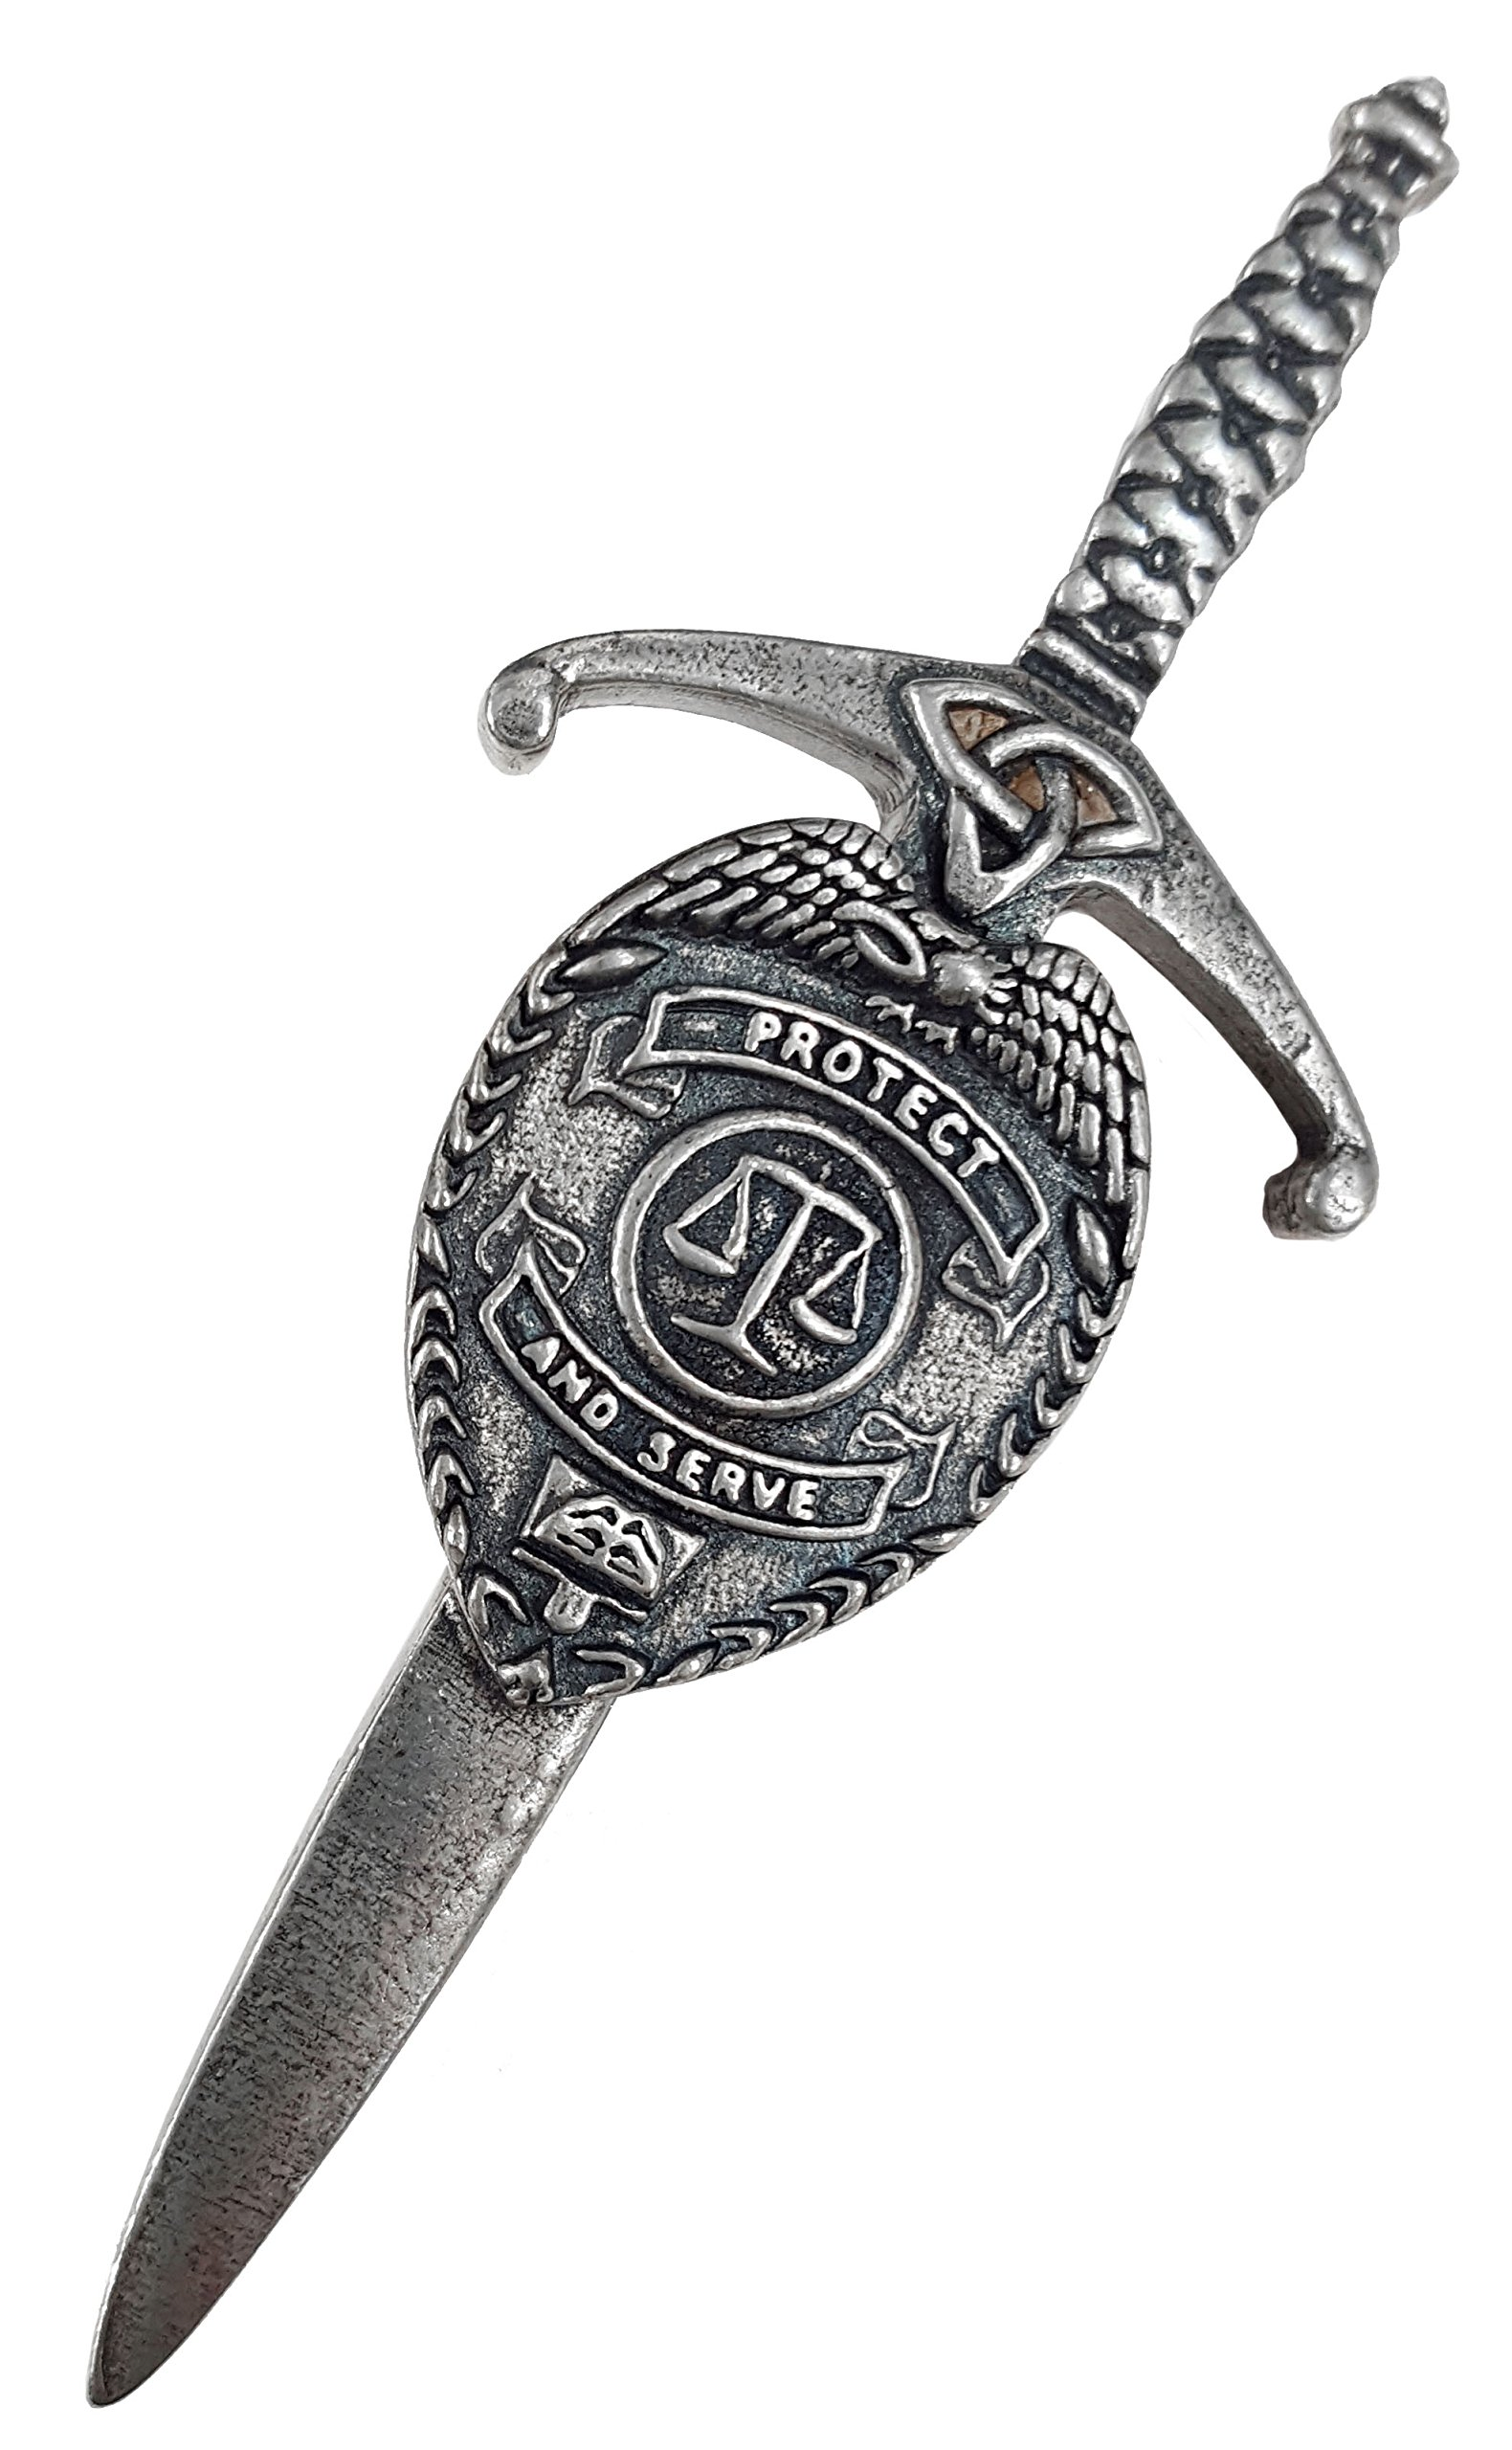 Protect and Serve Law Enforcement Kilt Pin